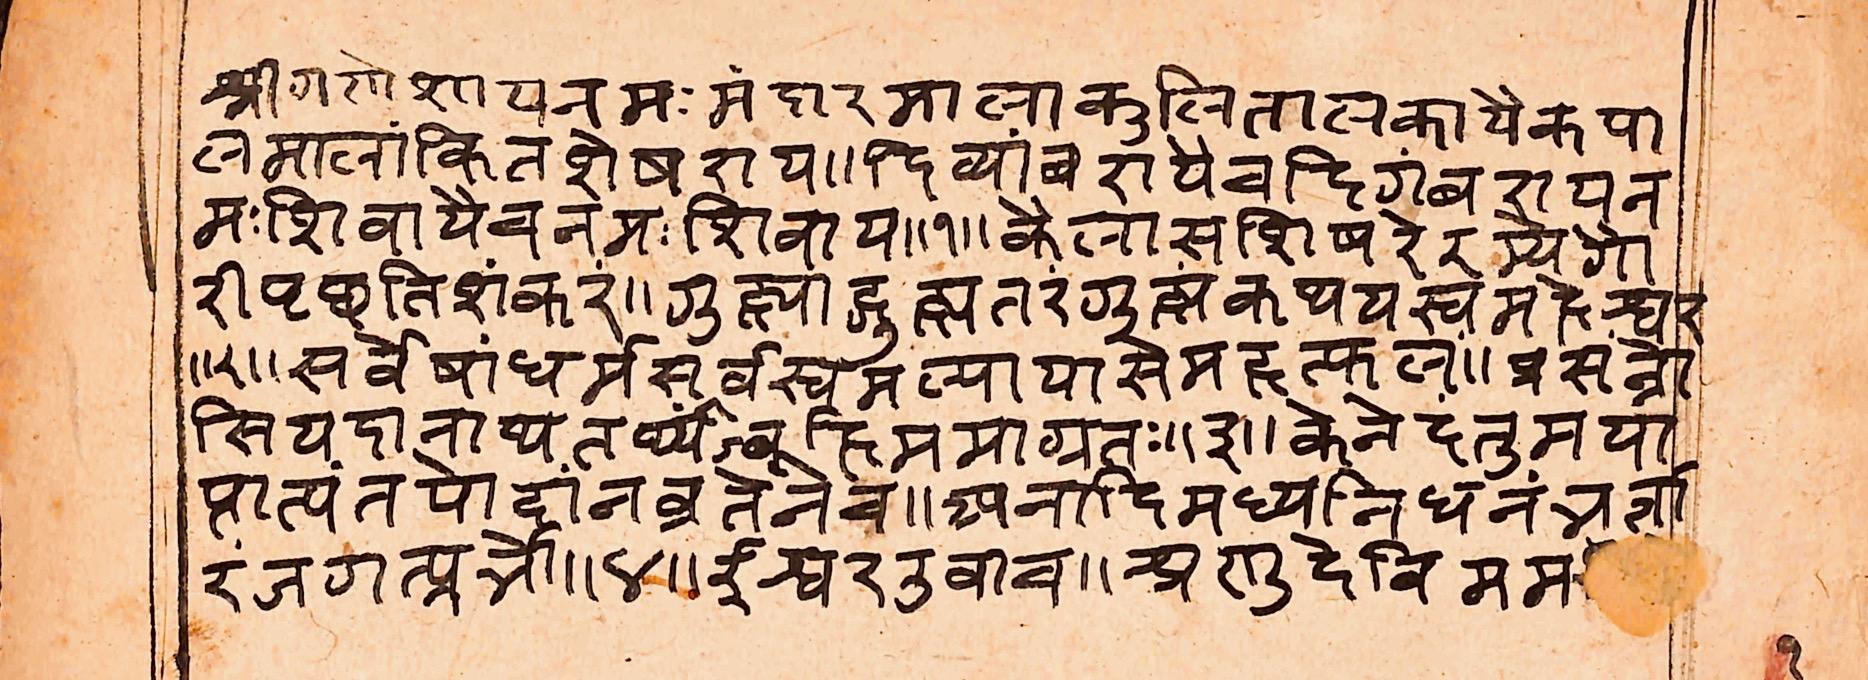 Vishnu Puran In Marathi Pdf